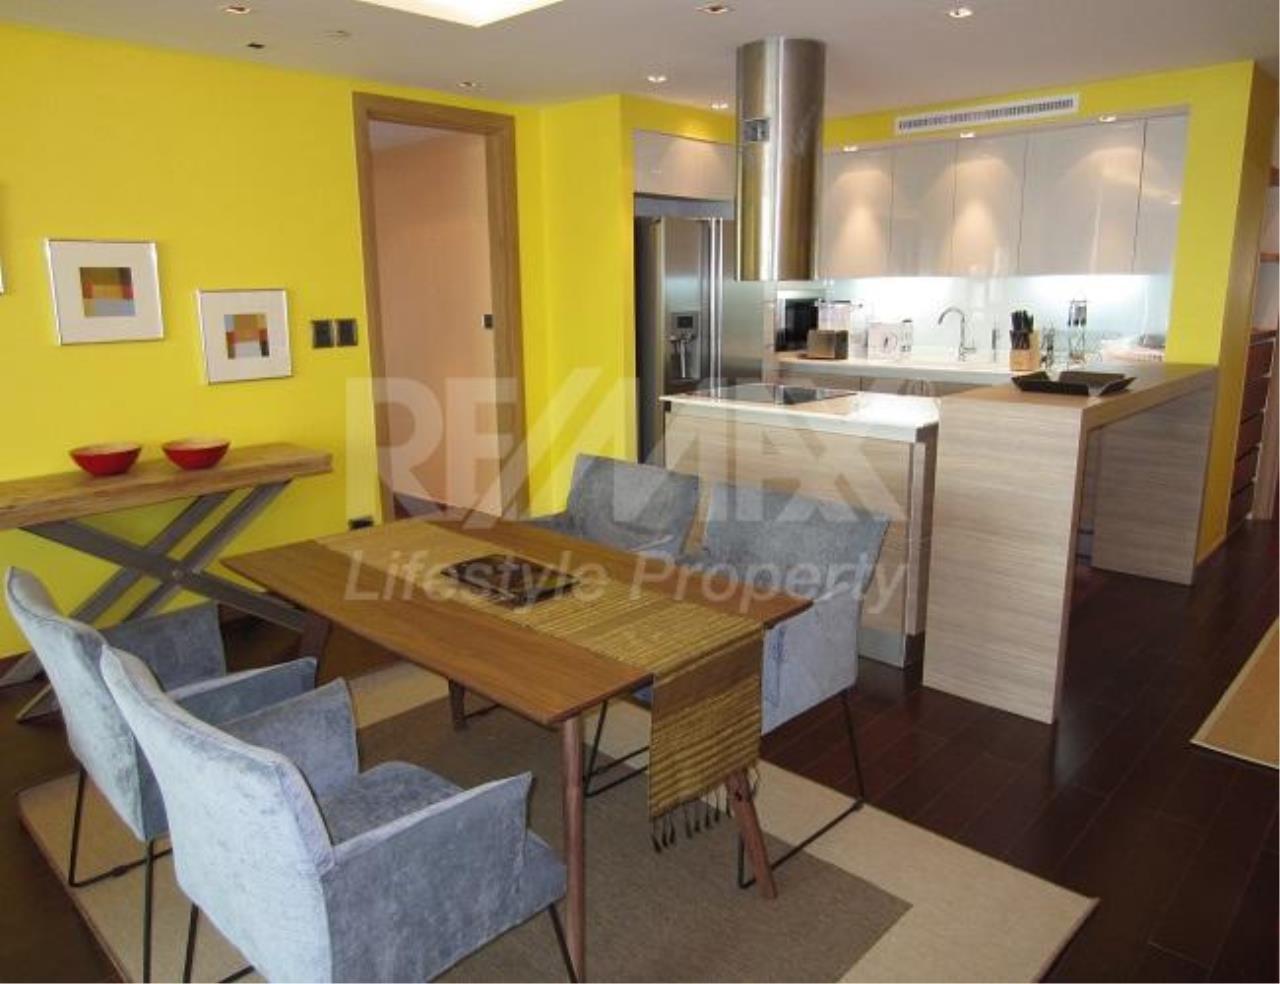 RE/MAX LifeStyle Property Agency's Le Monaco Residence Ari 4